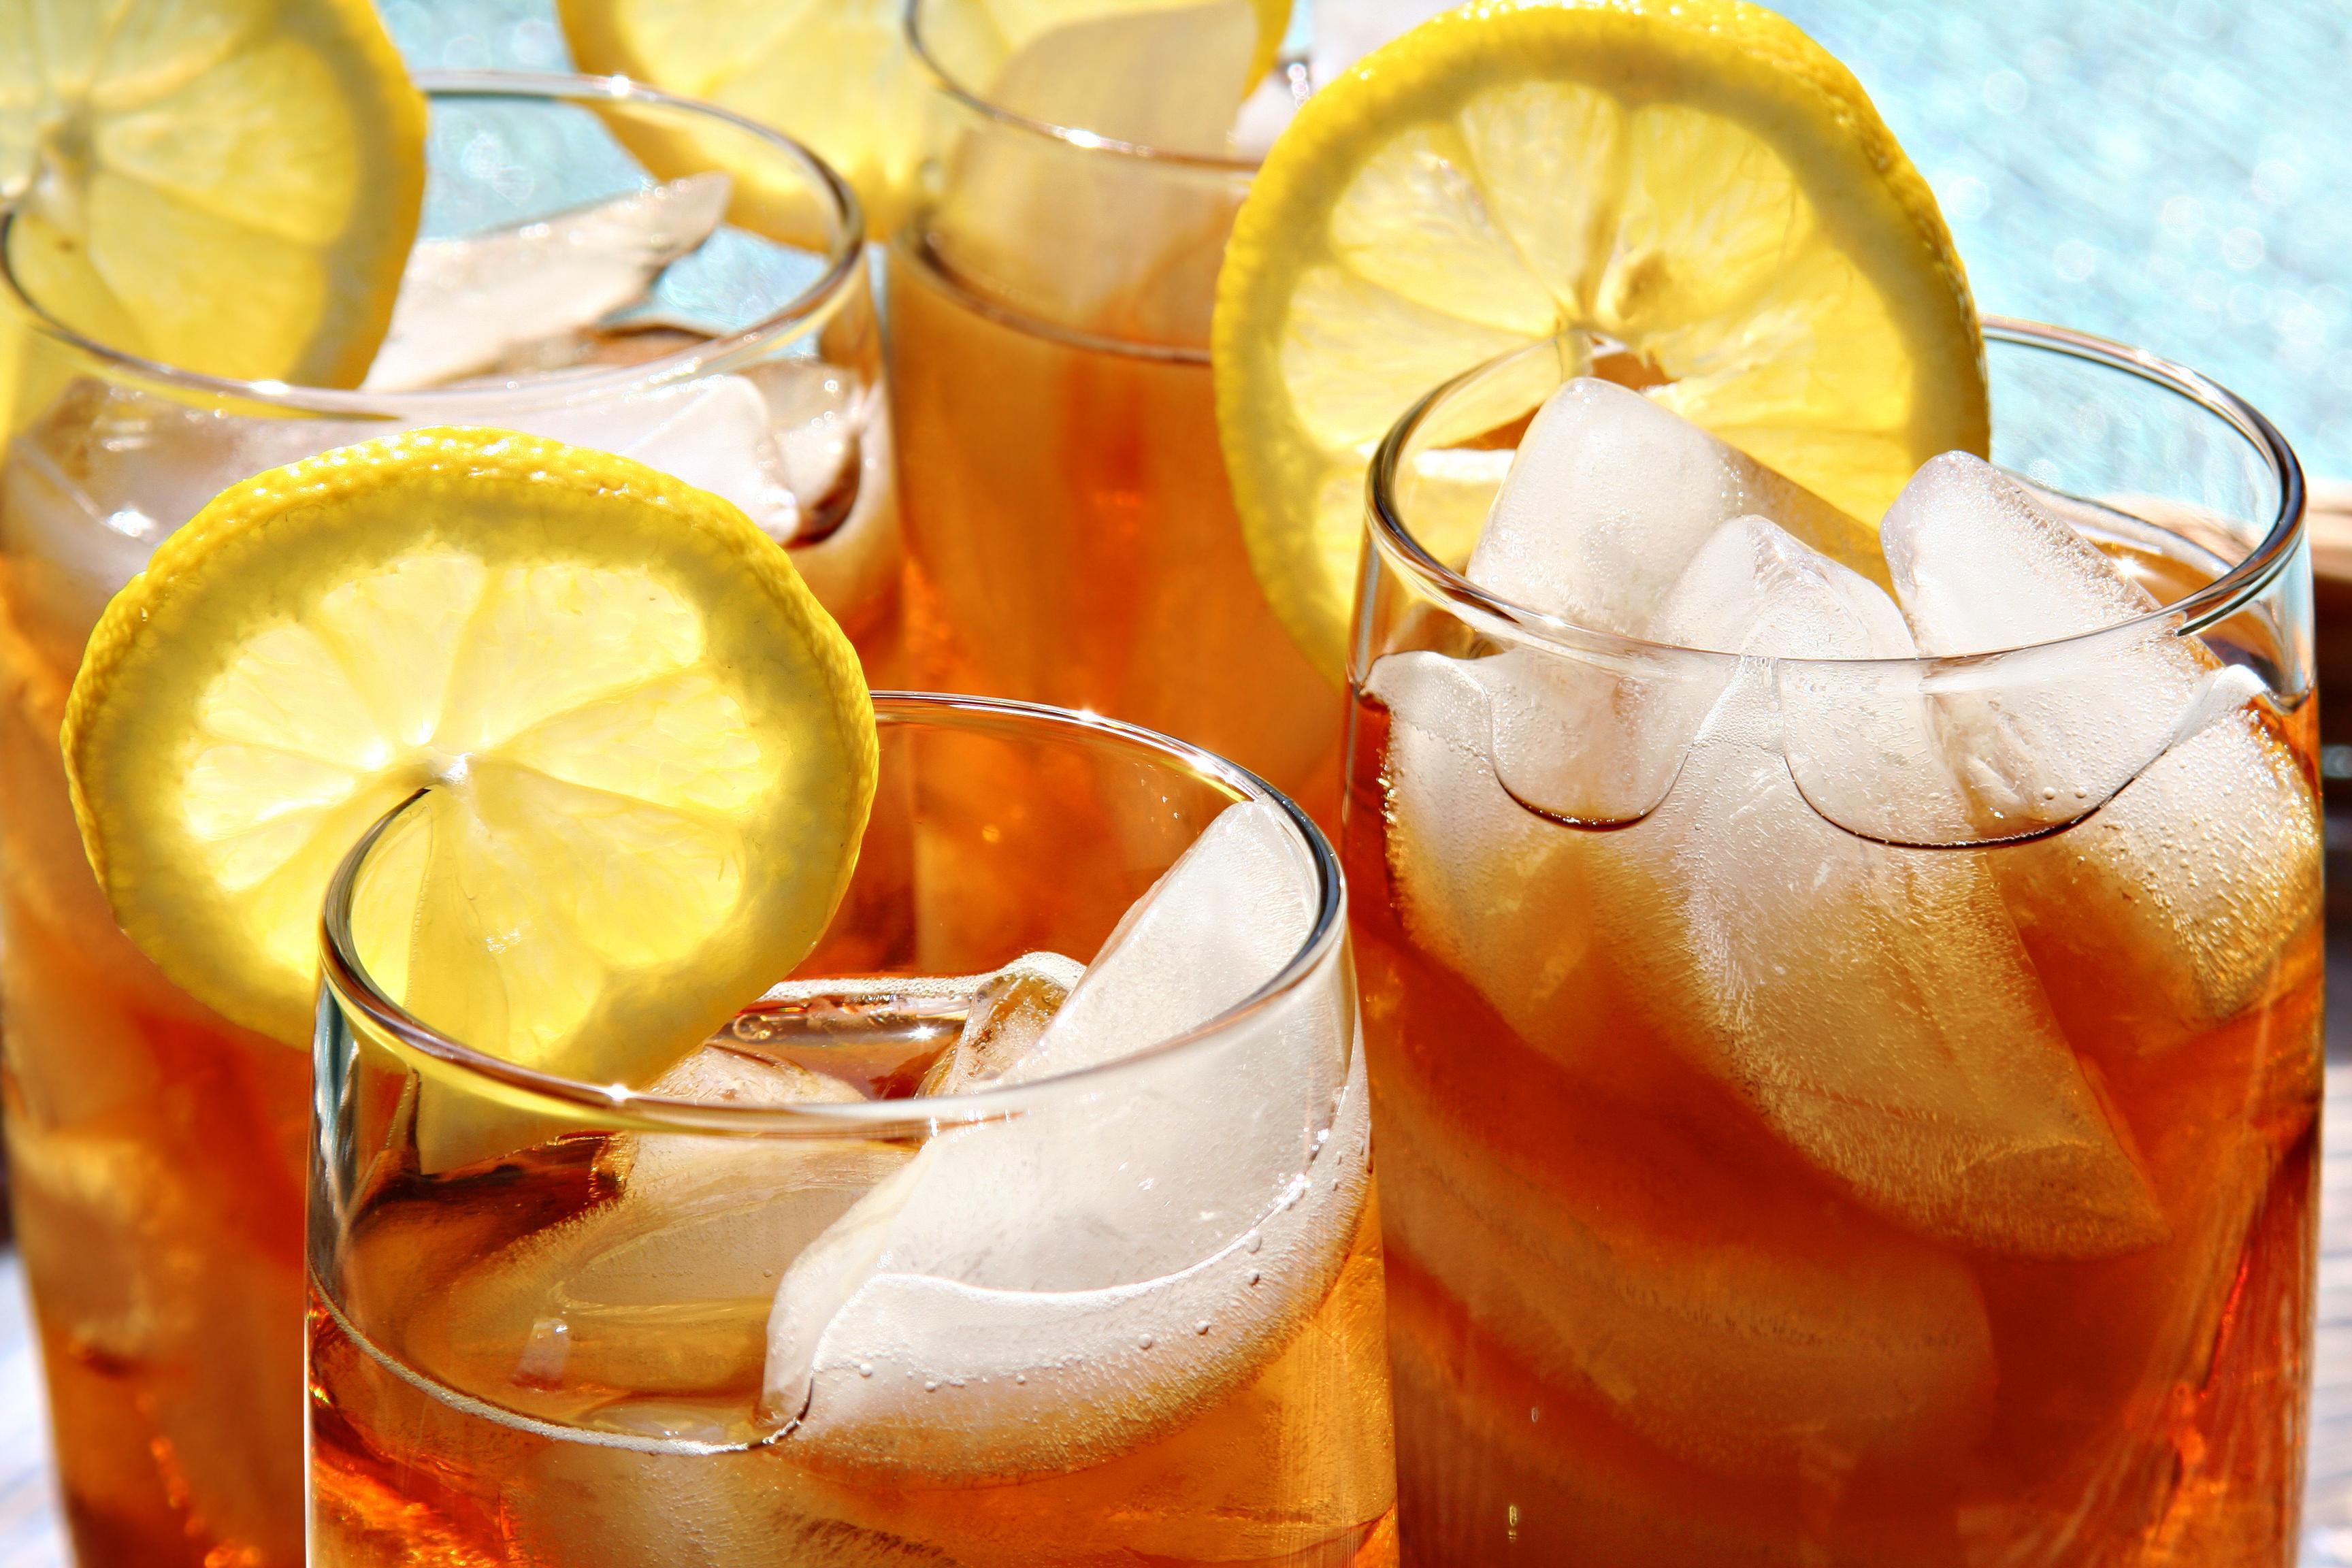 Dieta do Chá Vermelho – Dicas Para Inserir o Chá Vermelho e até Chia na Dieta